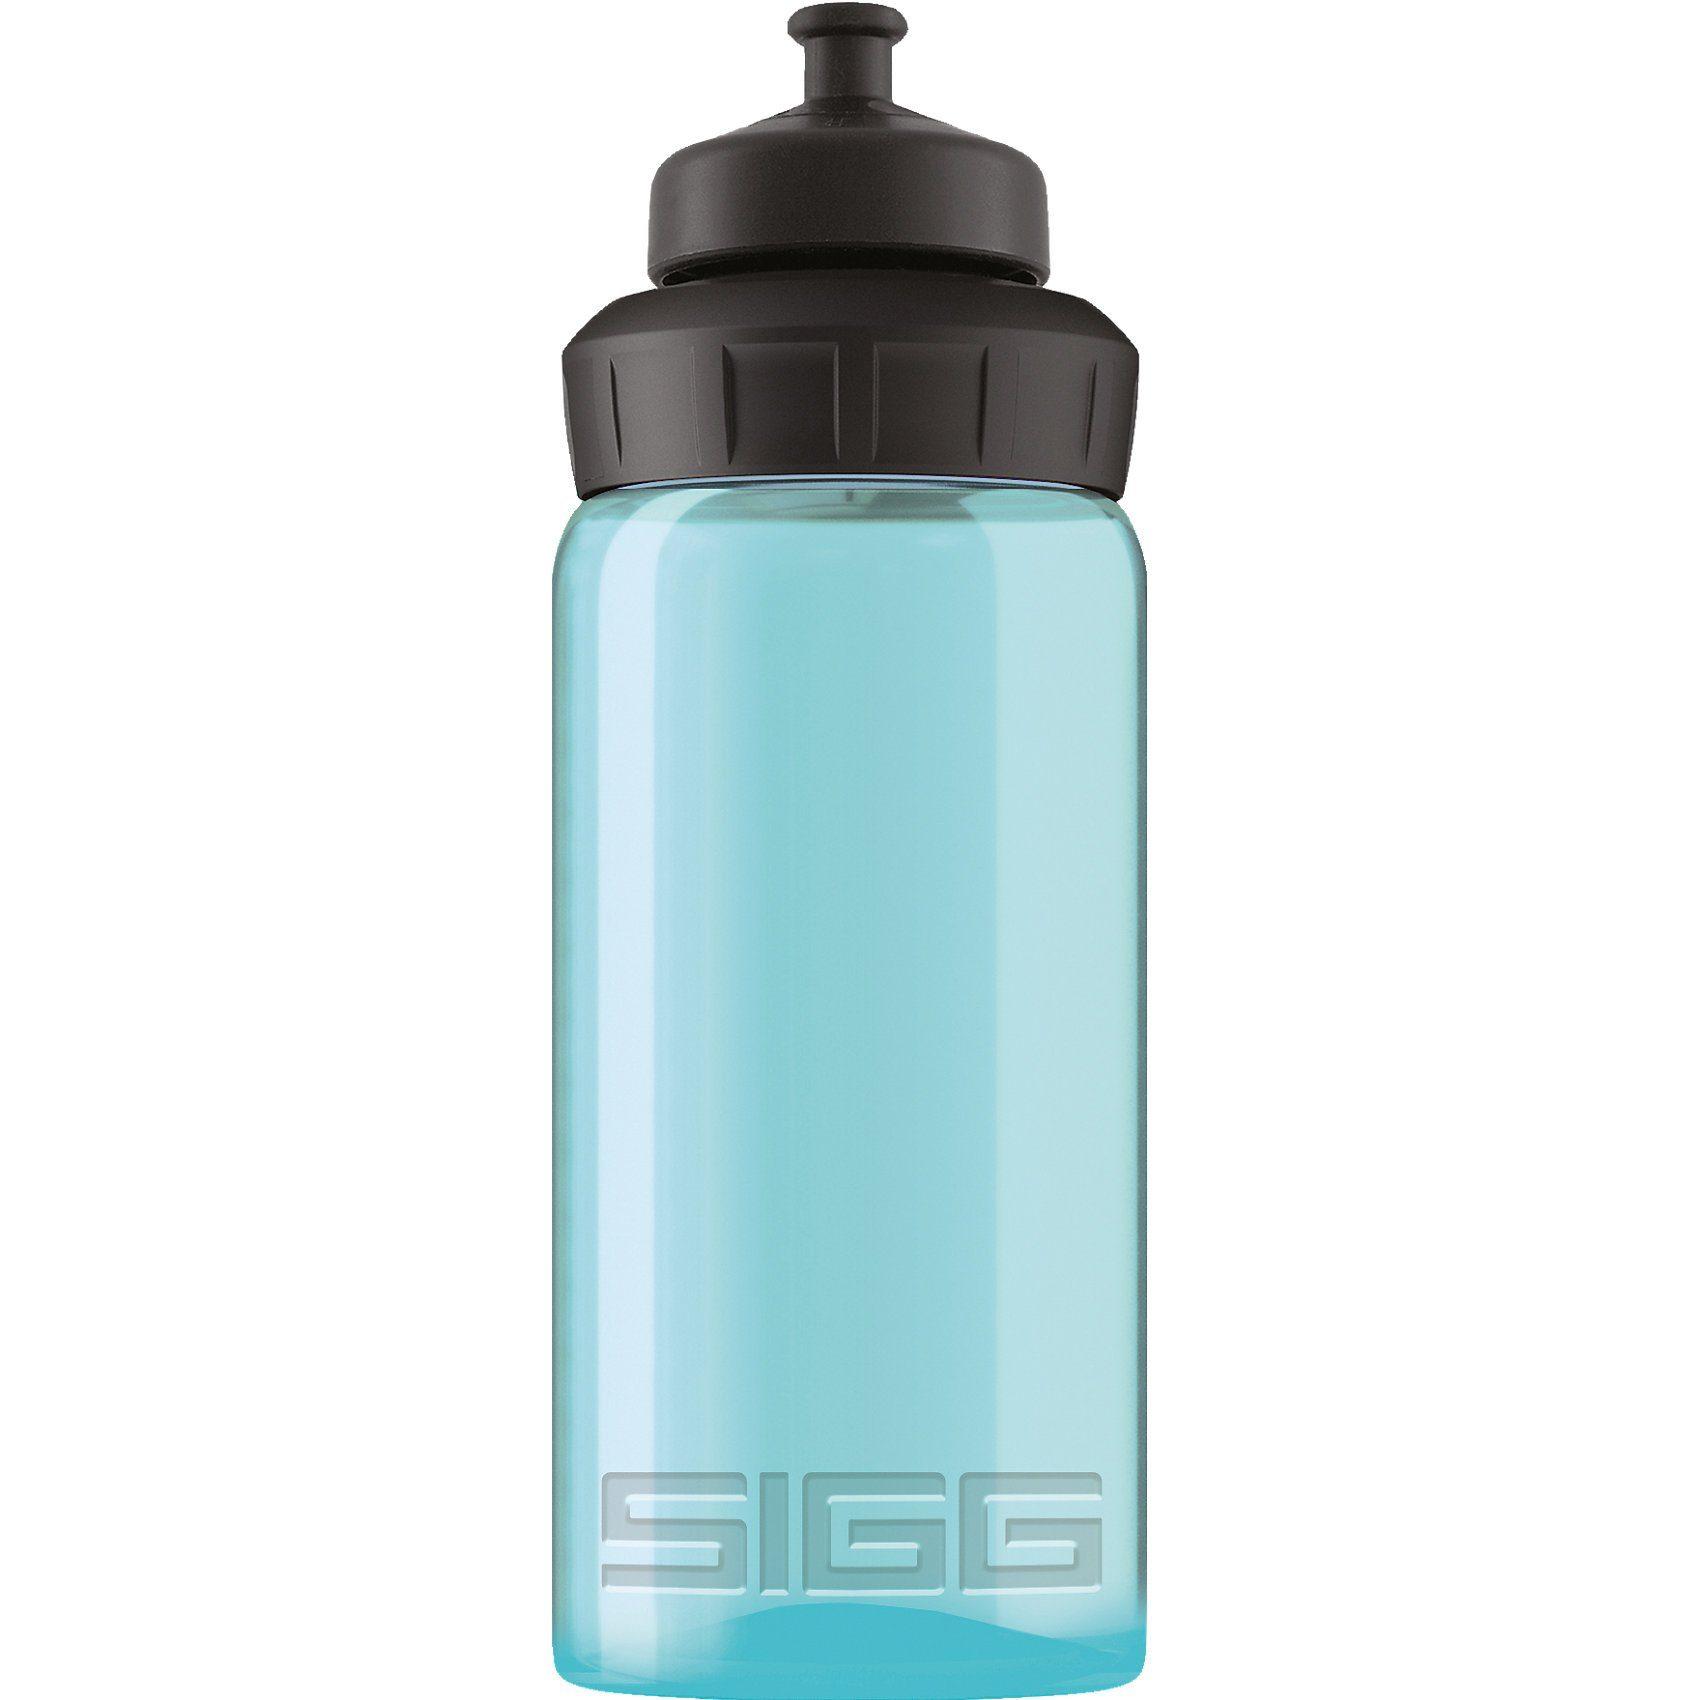 Sigg Trinkflasche VIVA 3-STAGE Aqua, 500 ml